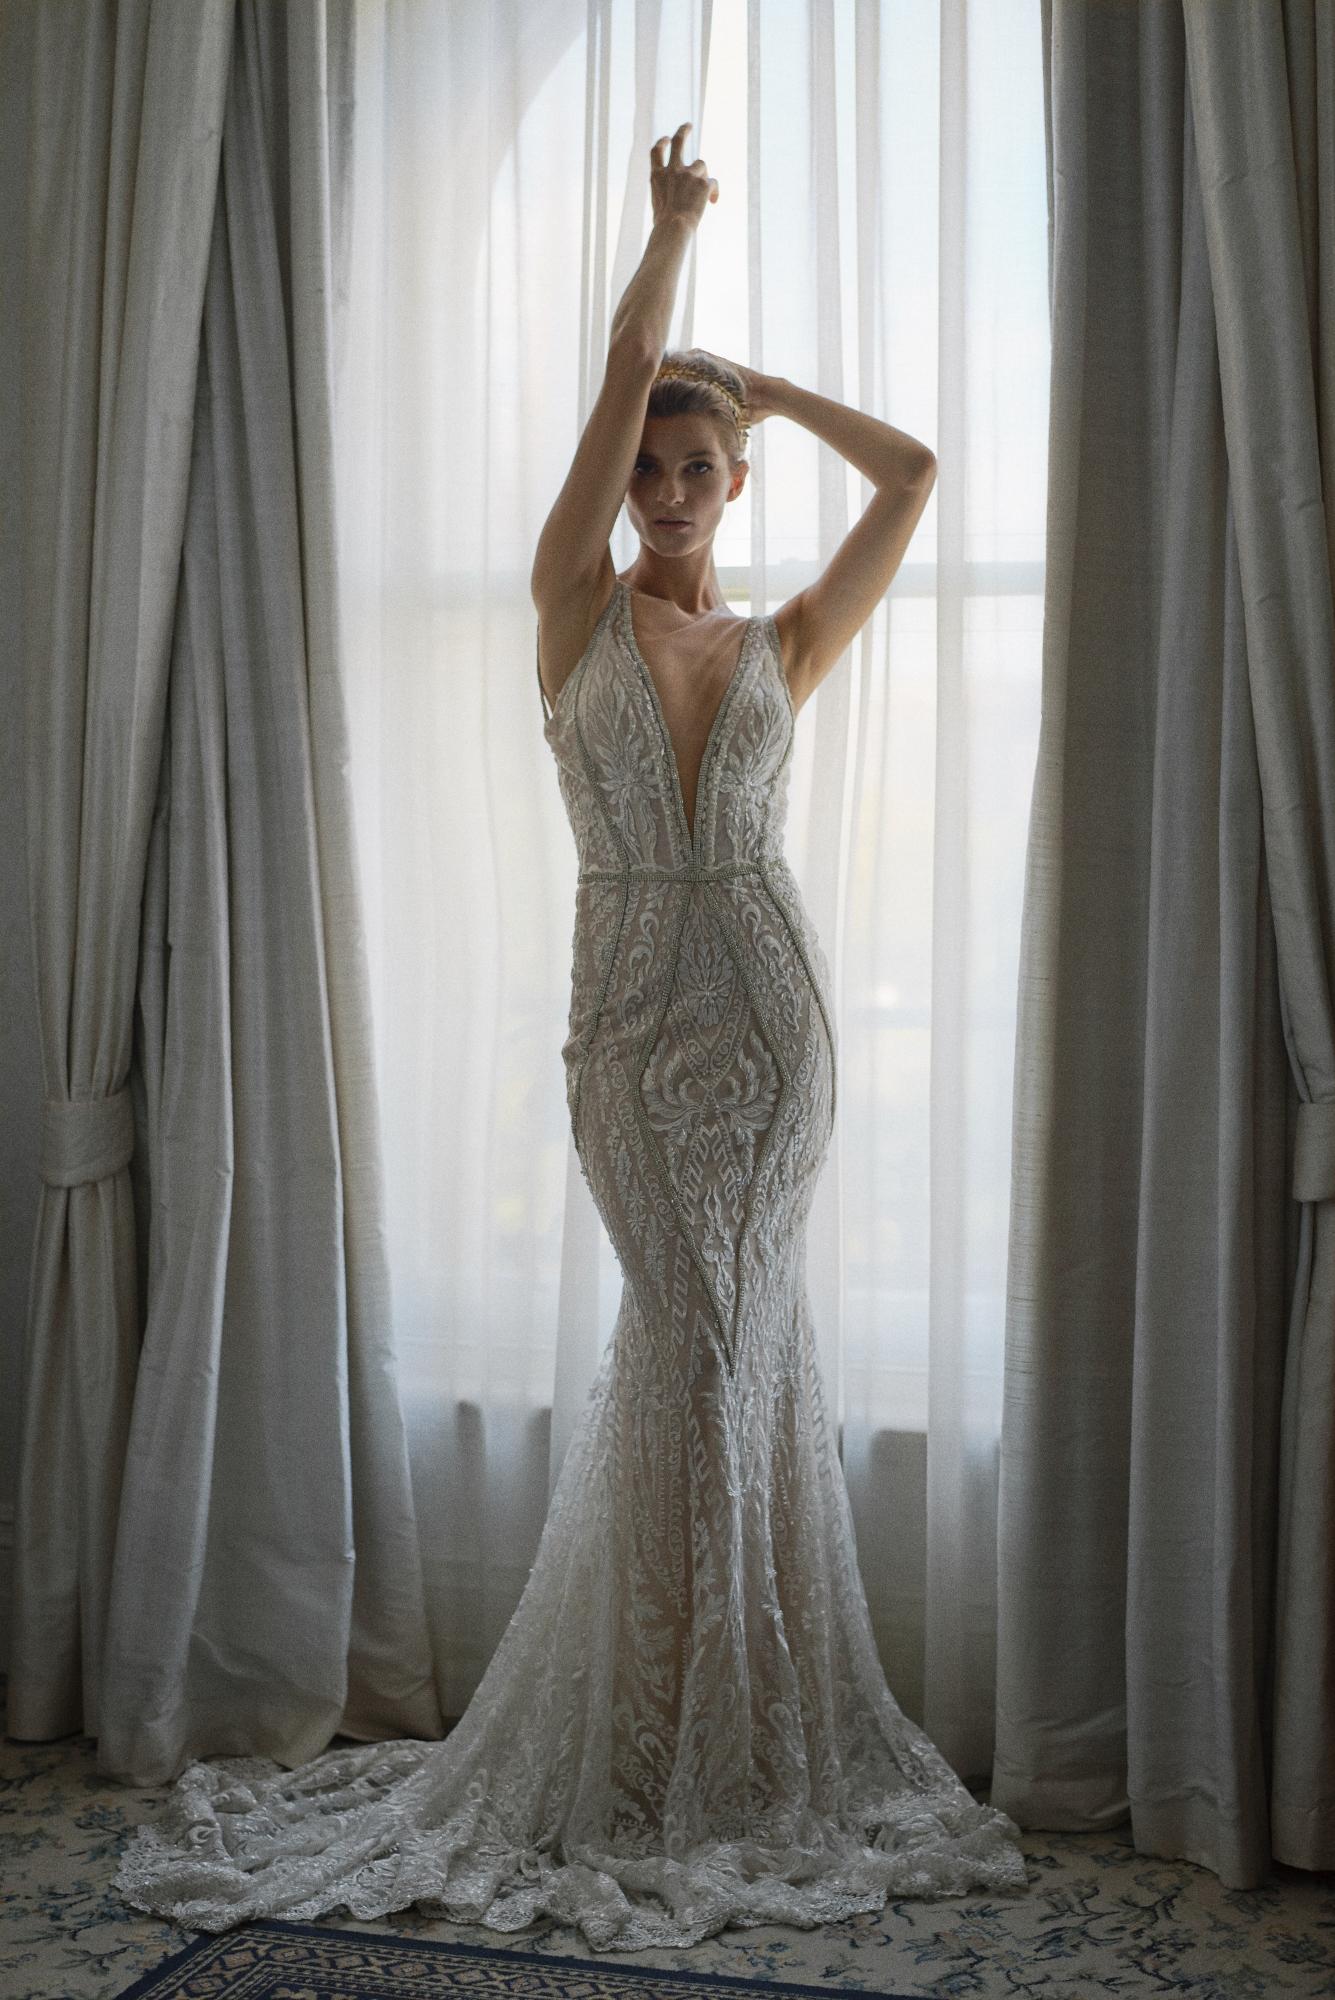 Sephory Photography-Her Morning Elegance Print 117 (1335x2000)